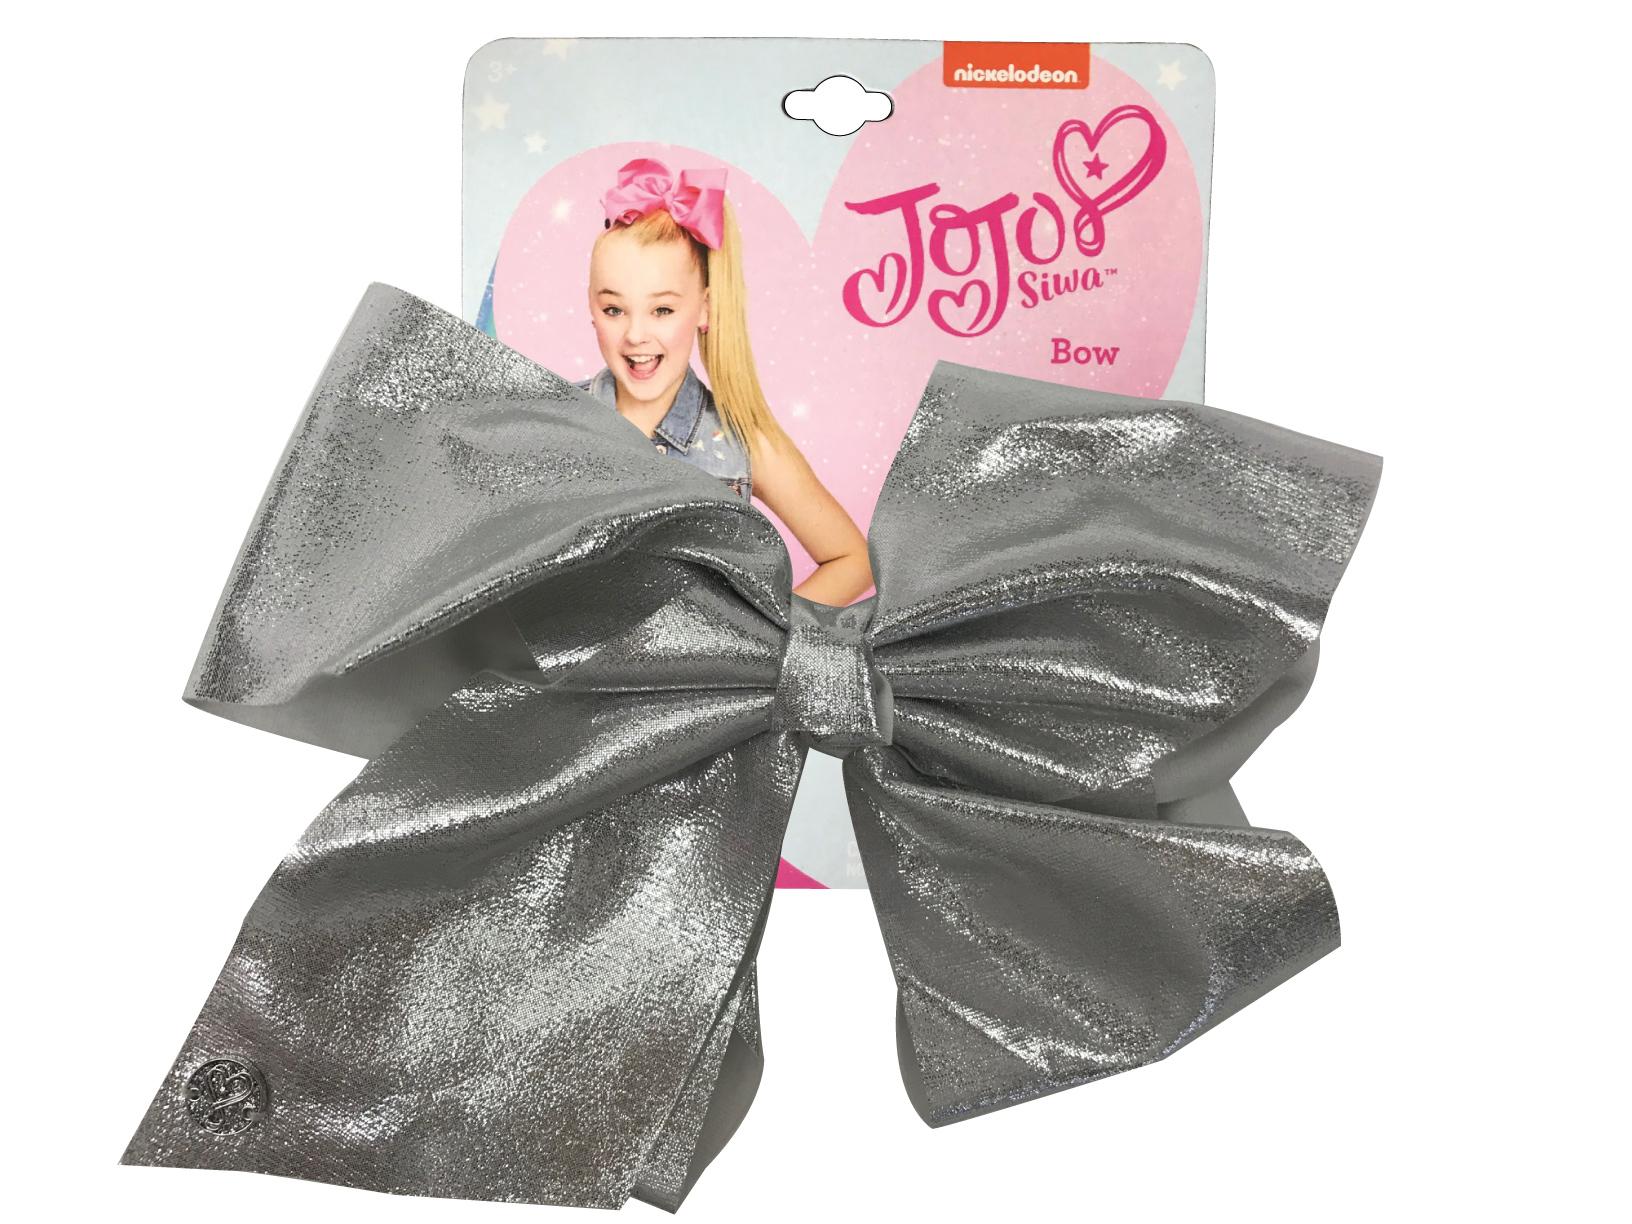 JoJo Siwa Large Cheer Hair Bow (Silver Glitter)